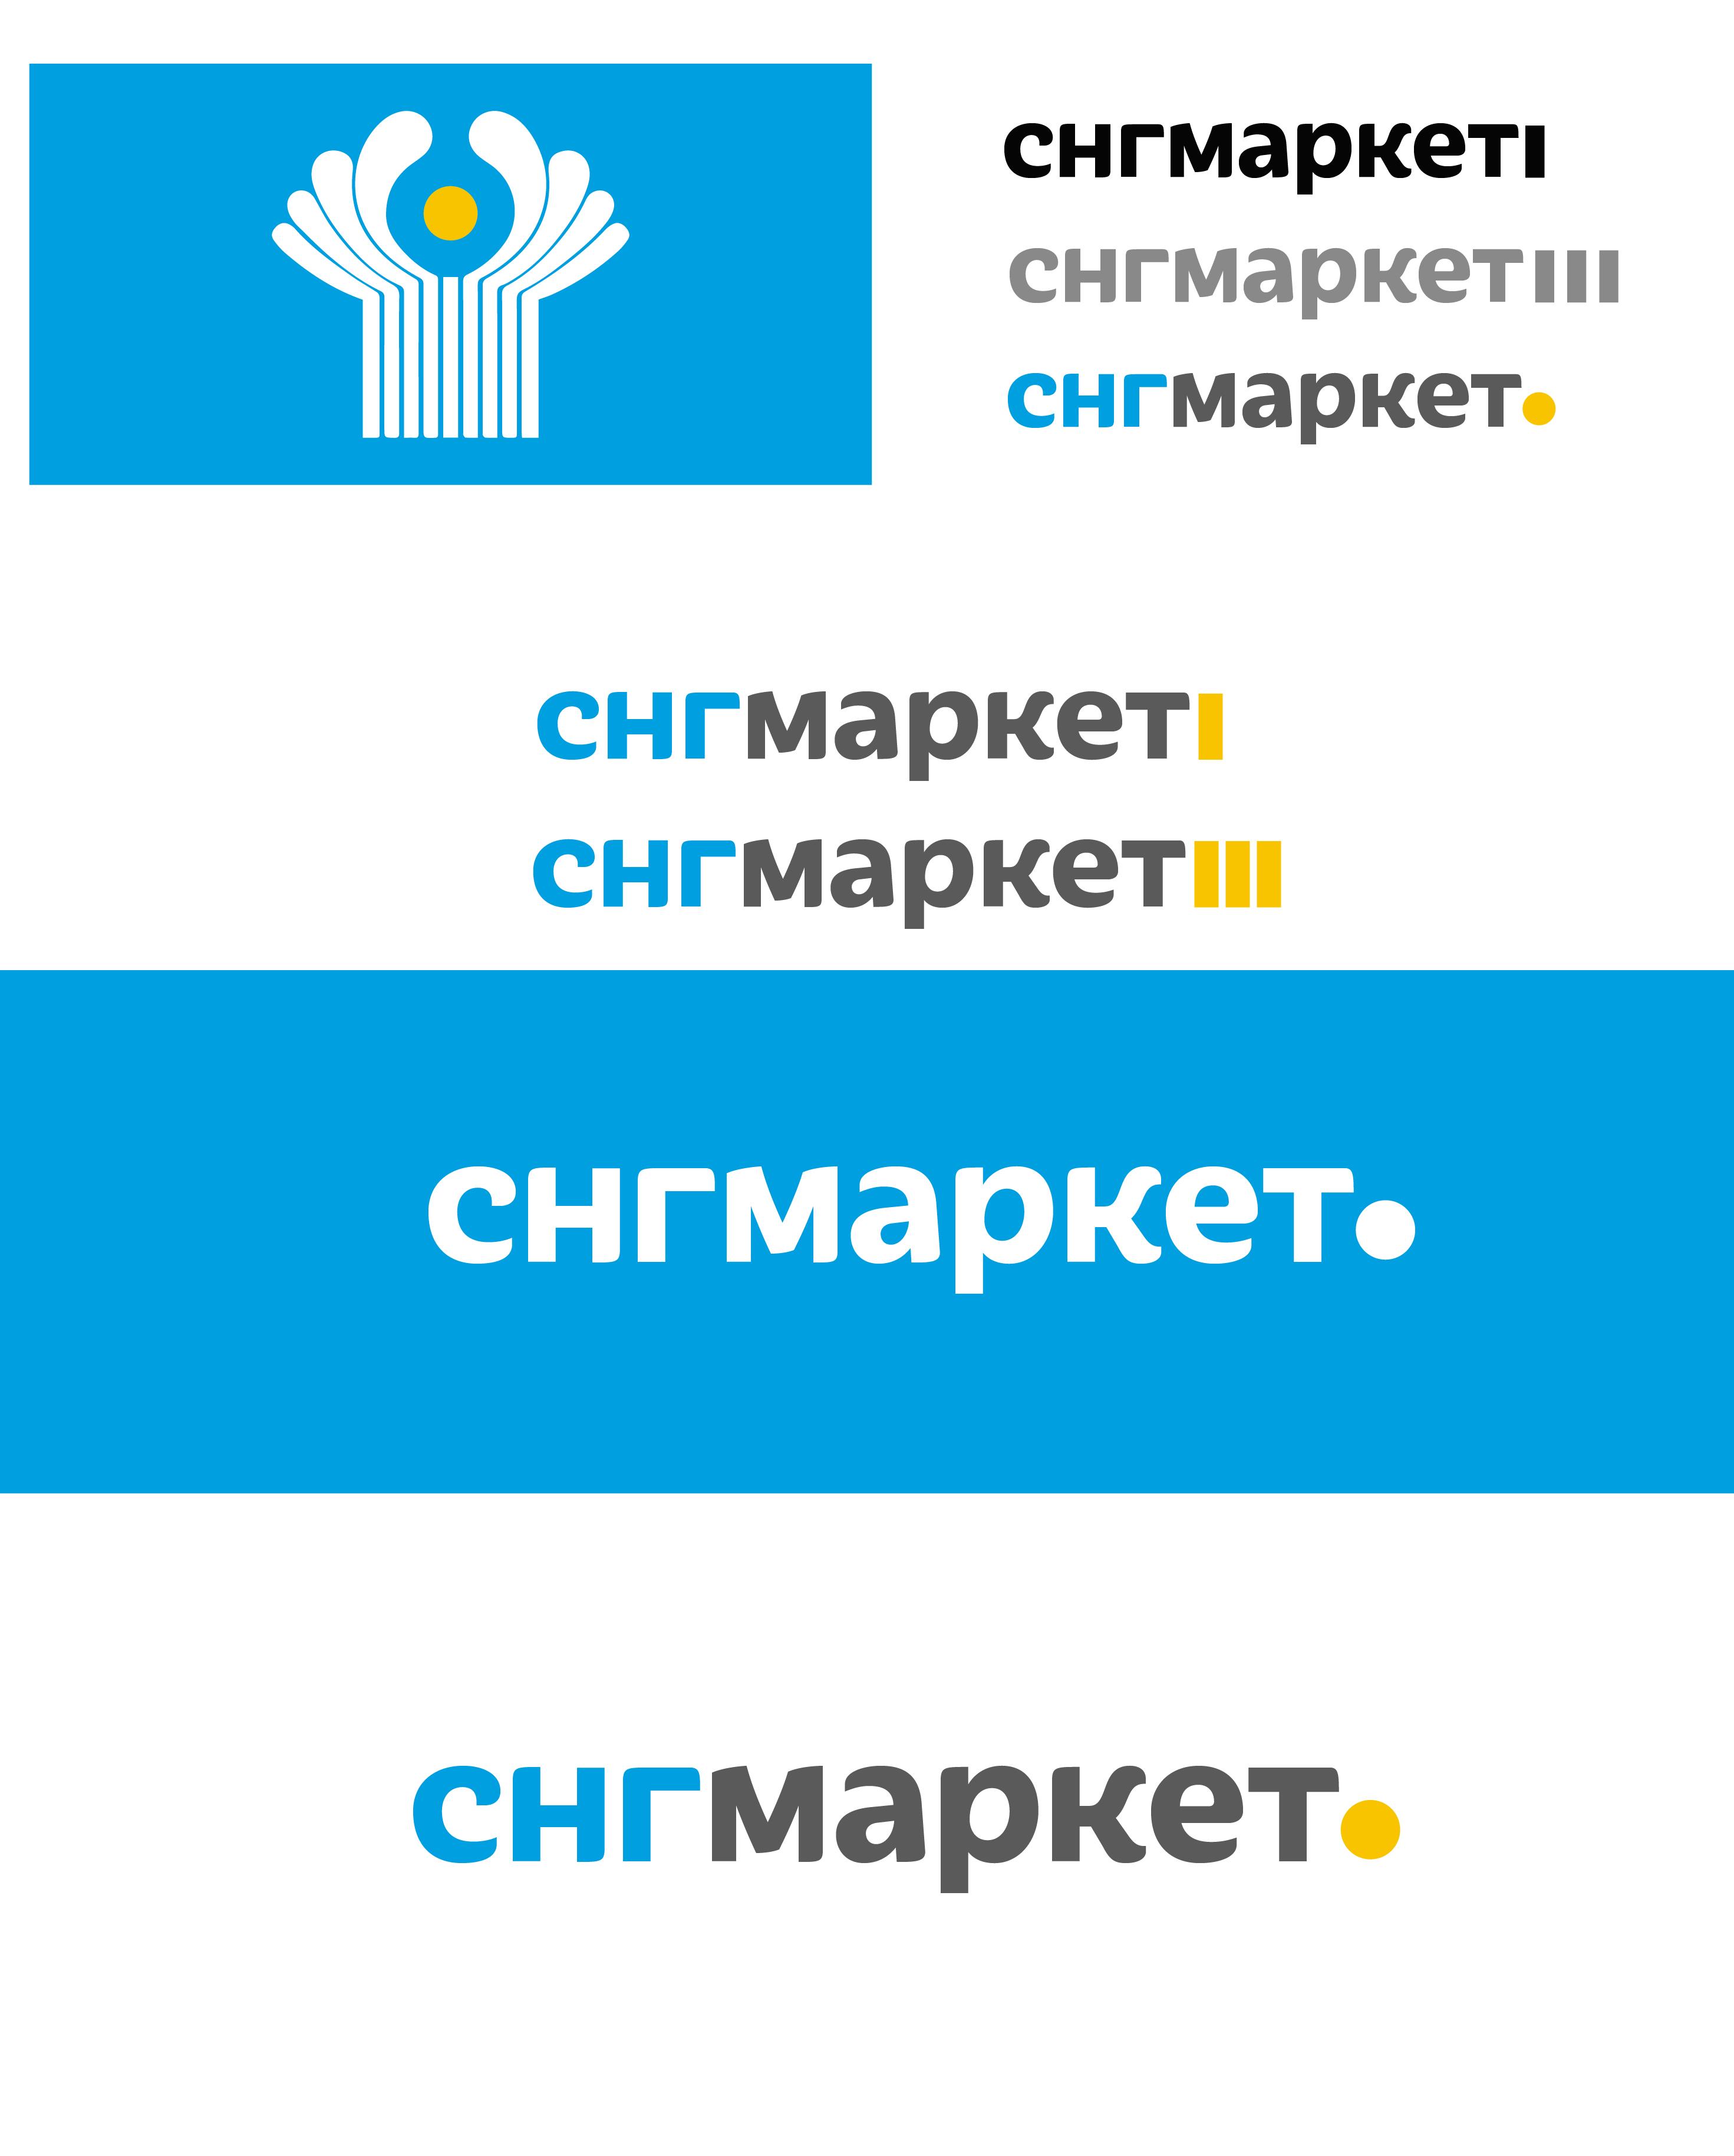 Объявляется конкурс на создание логотипа ИМ обуви фото f_6075a14c40e8fcc7.jpg